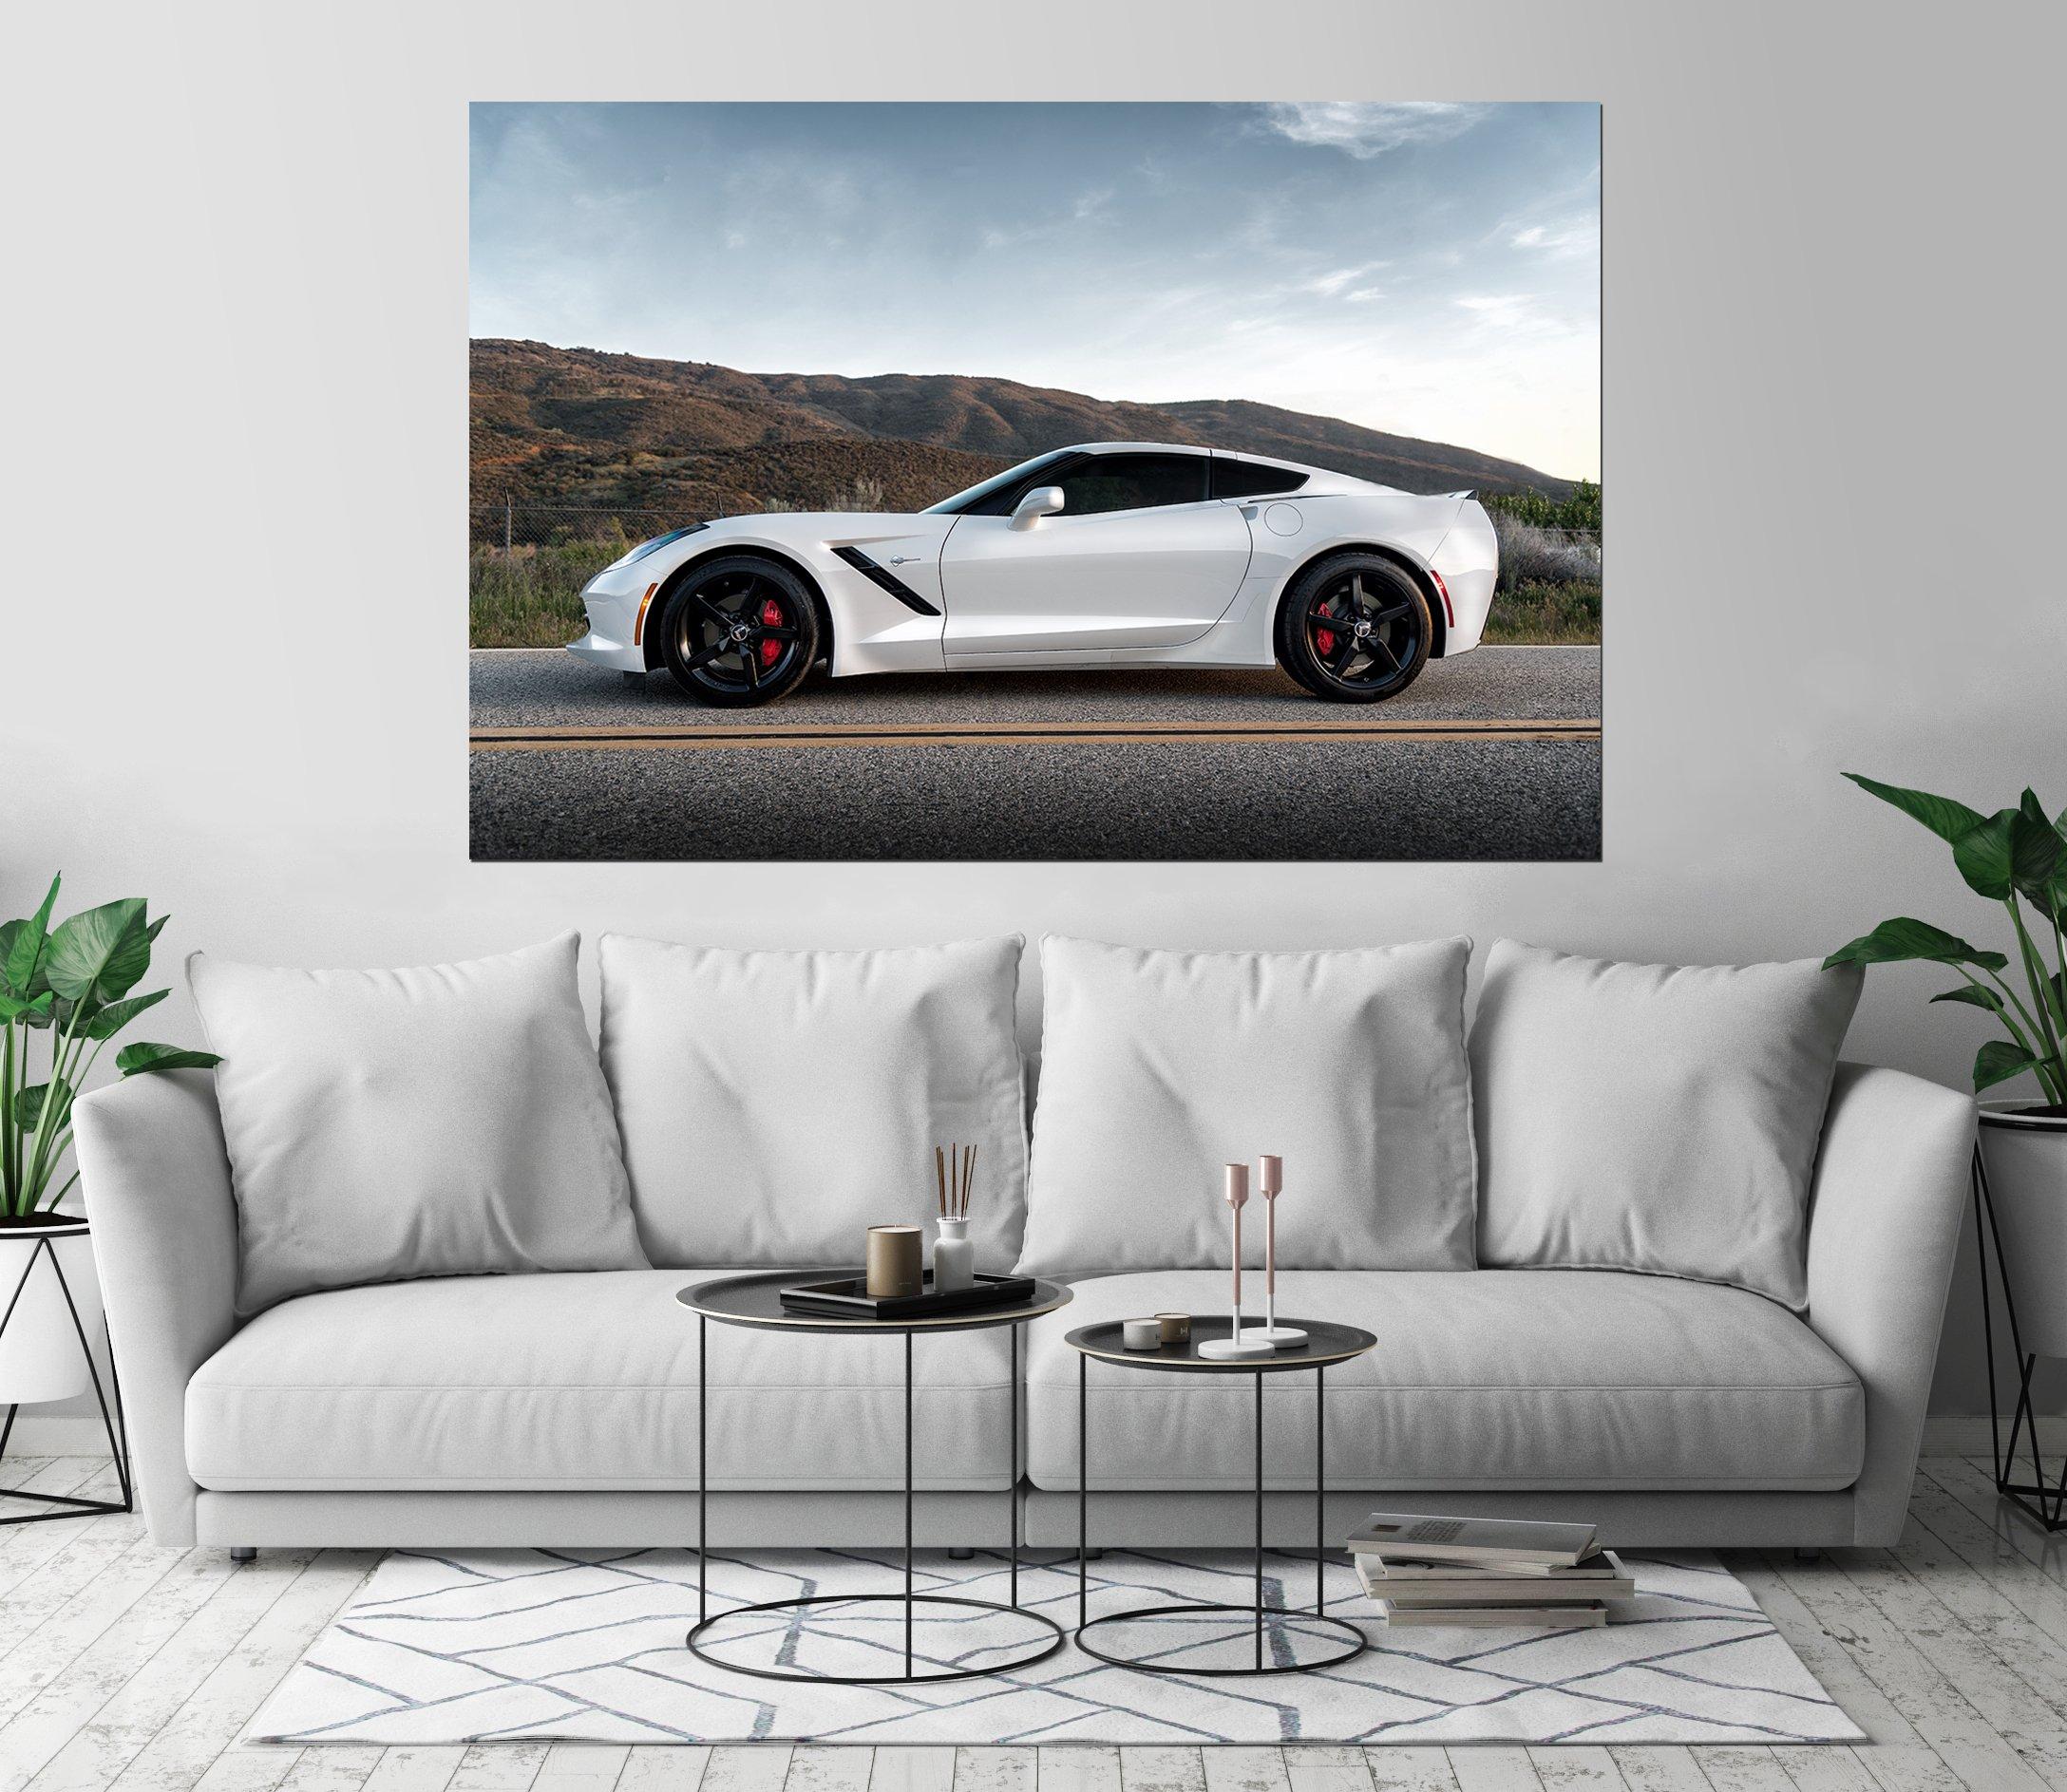 Corvette Stingray C7 Luxury Automobile Art Print Wall Decor Image Self-Adhesive - Wallpaper Sticker 40 x 60-2XL